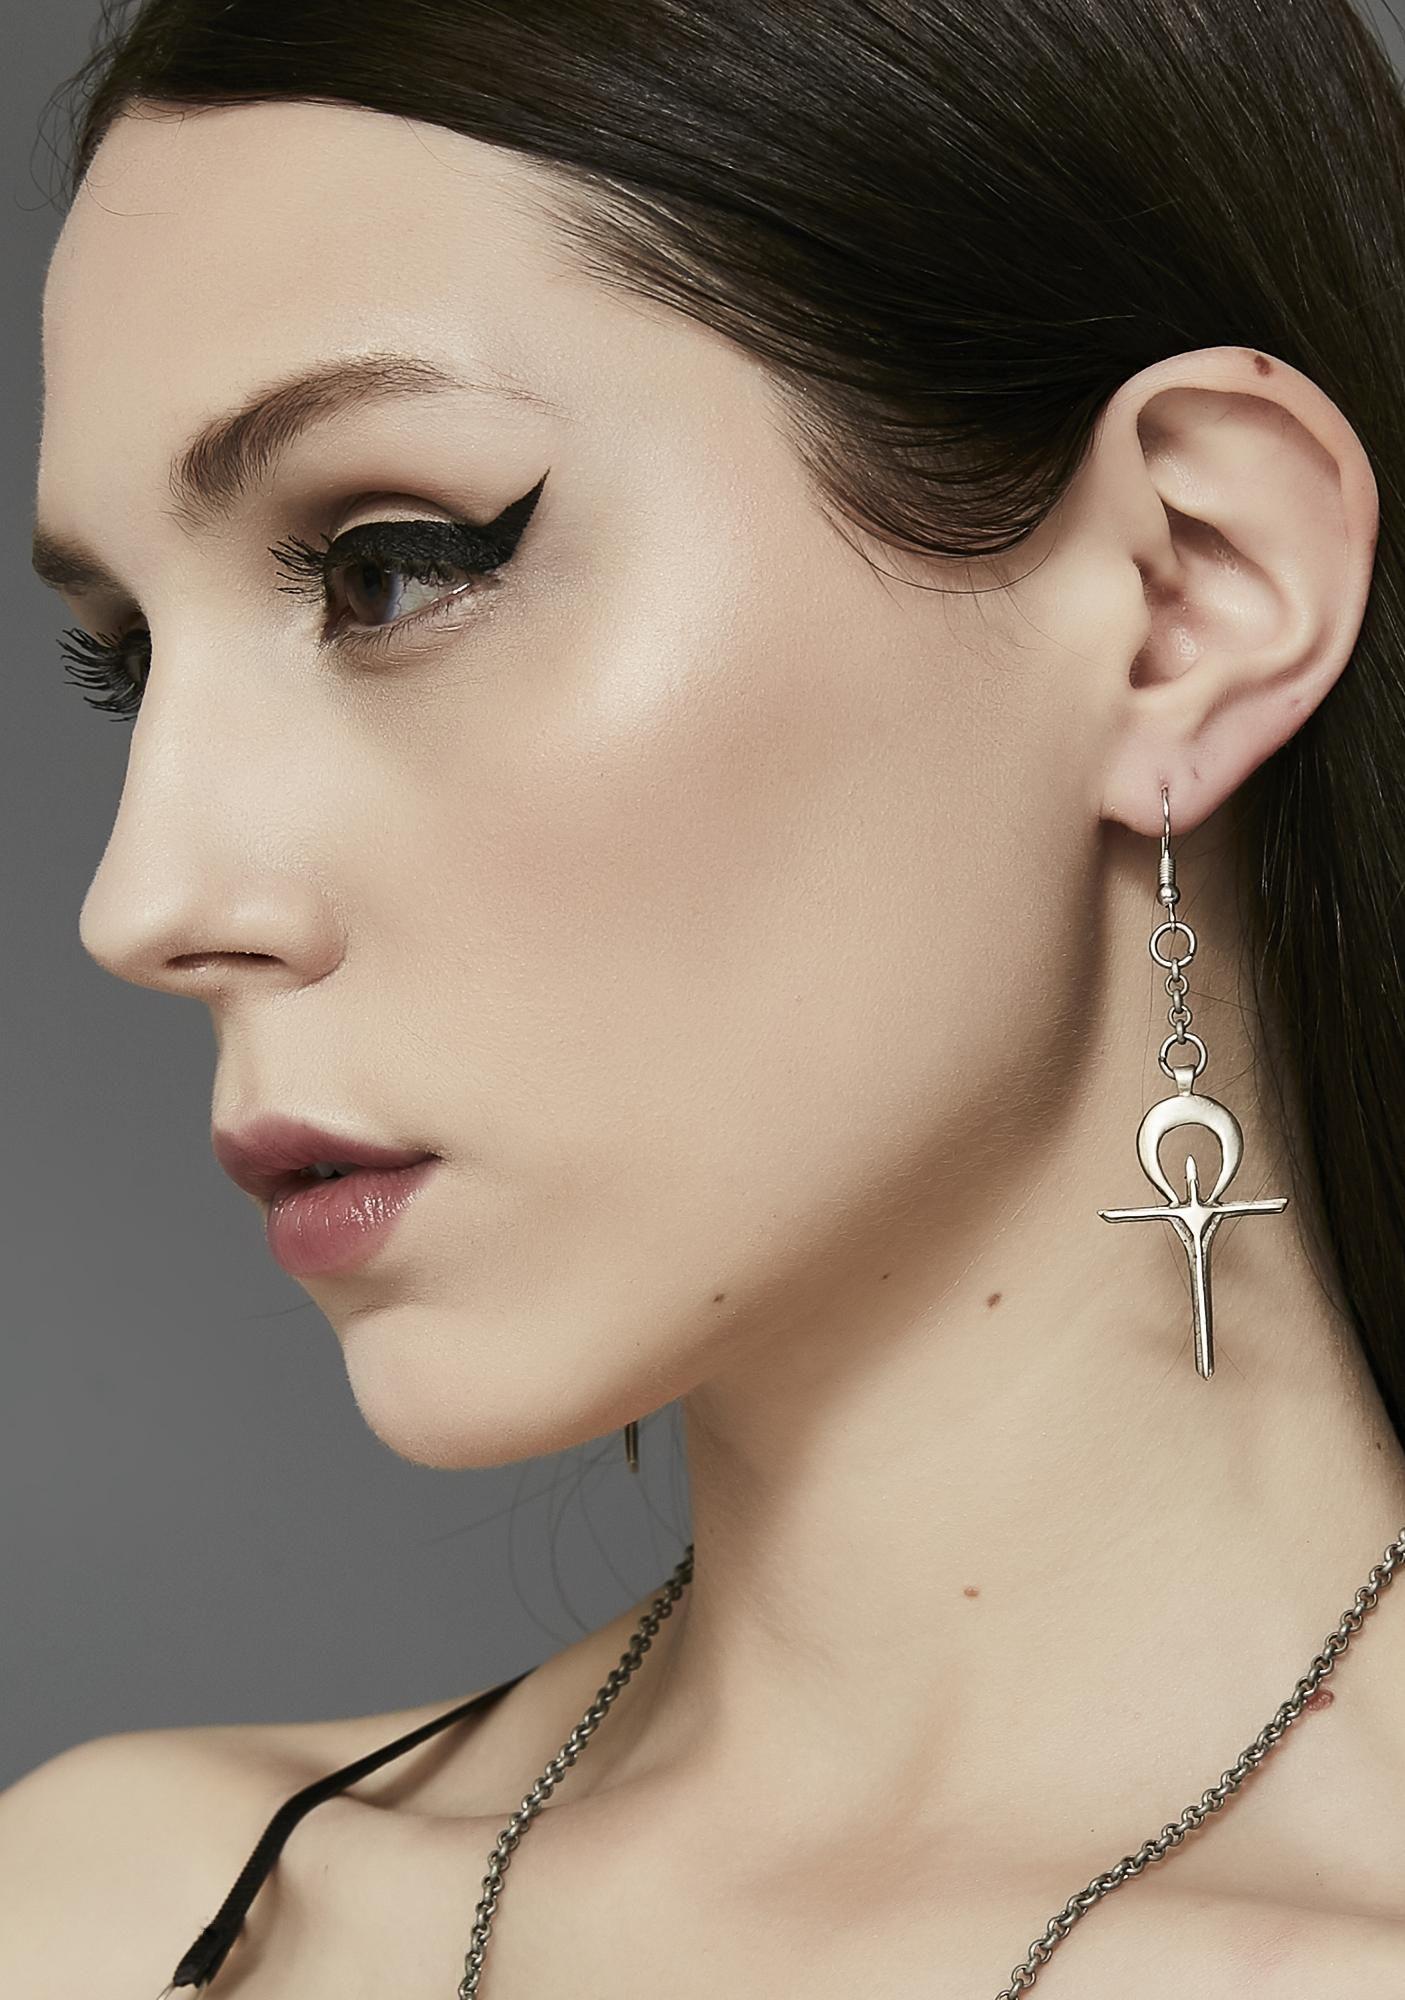 Acid Queen Jewelry X Widow Immortal Souls Earrings at Dolls Kill bdeaec6d2